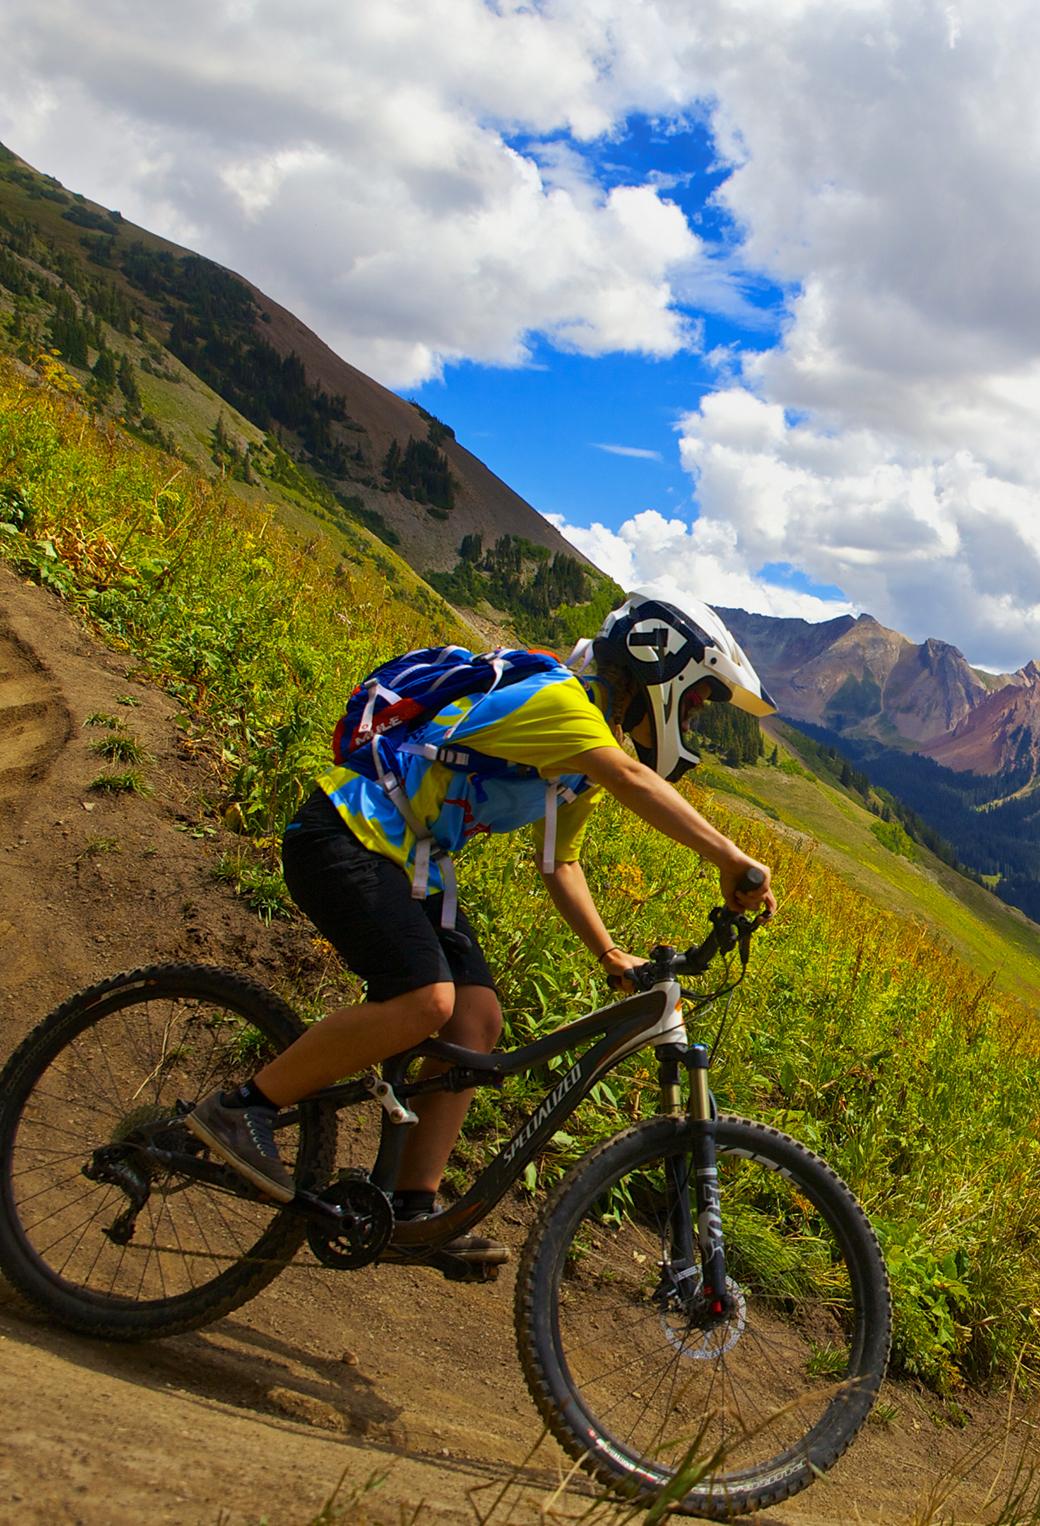 Mountain Bike 3Wallpapers iphone parallax Mountain Bike